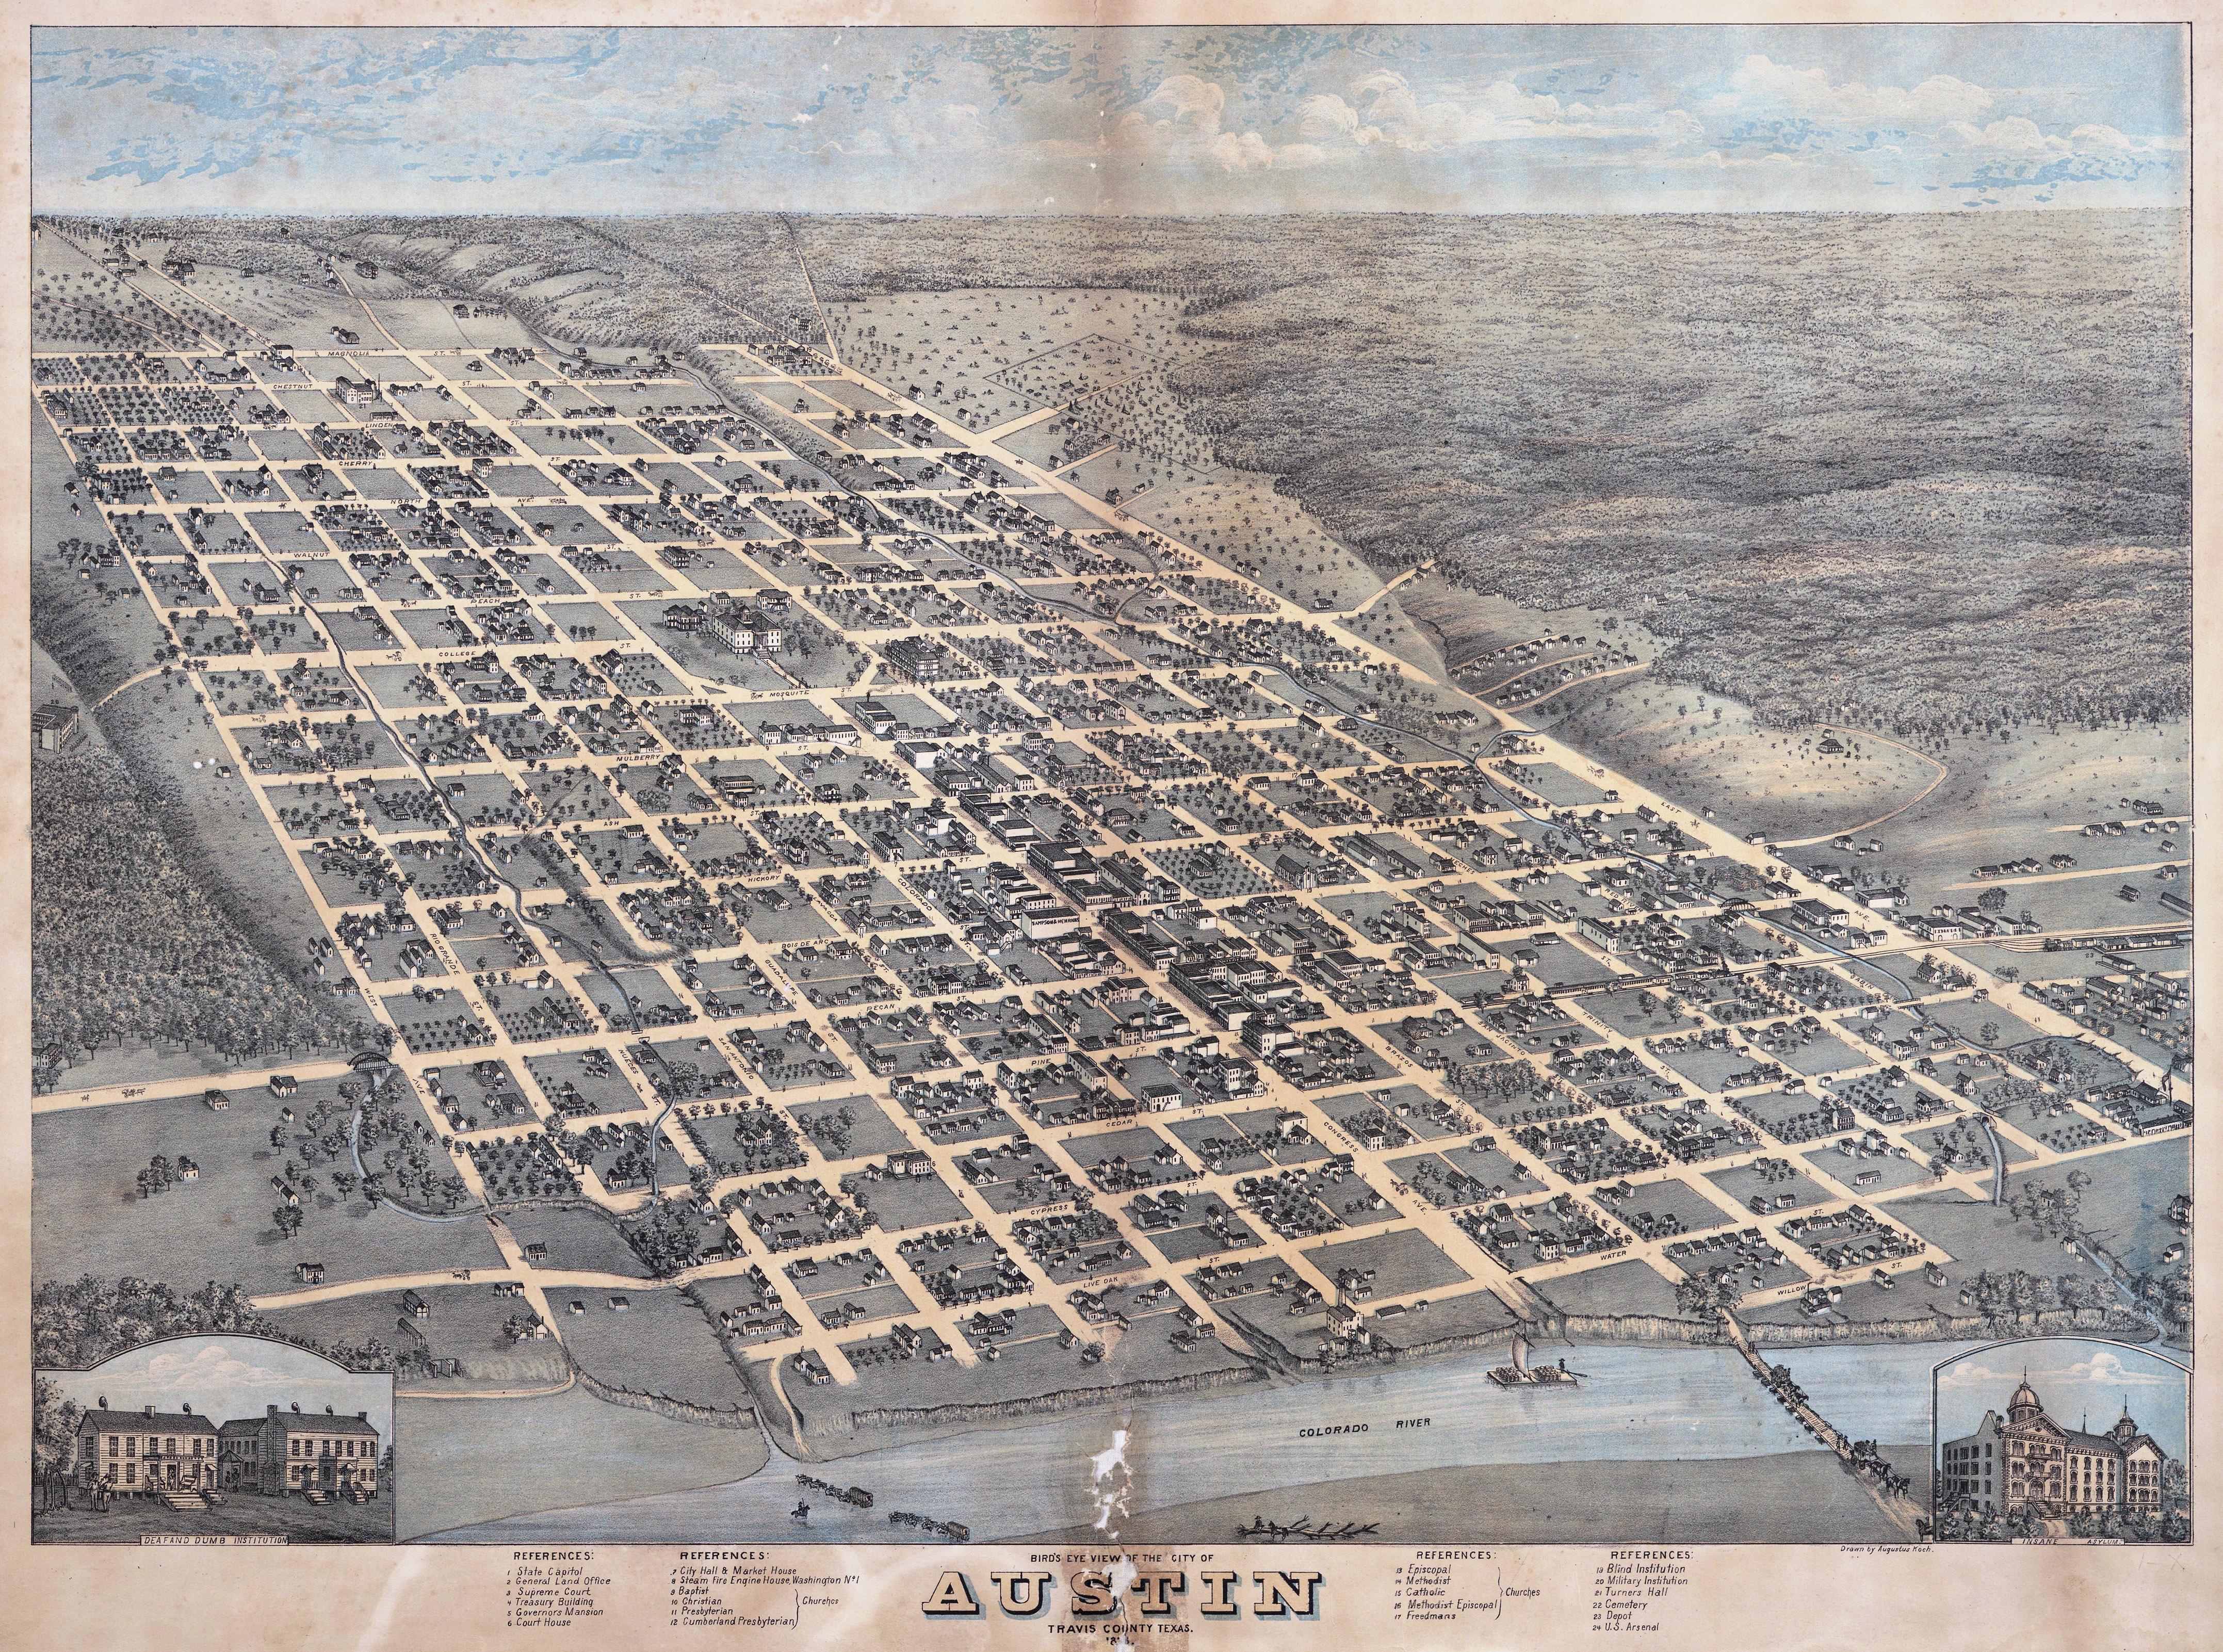 File:Old map-Austin-1873-sm.jpg - Wikimedia Commons